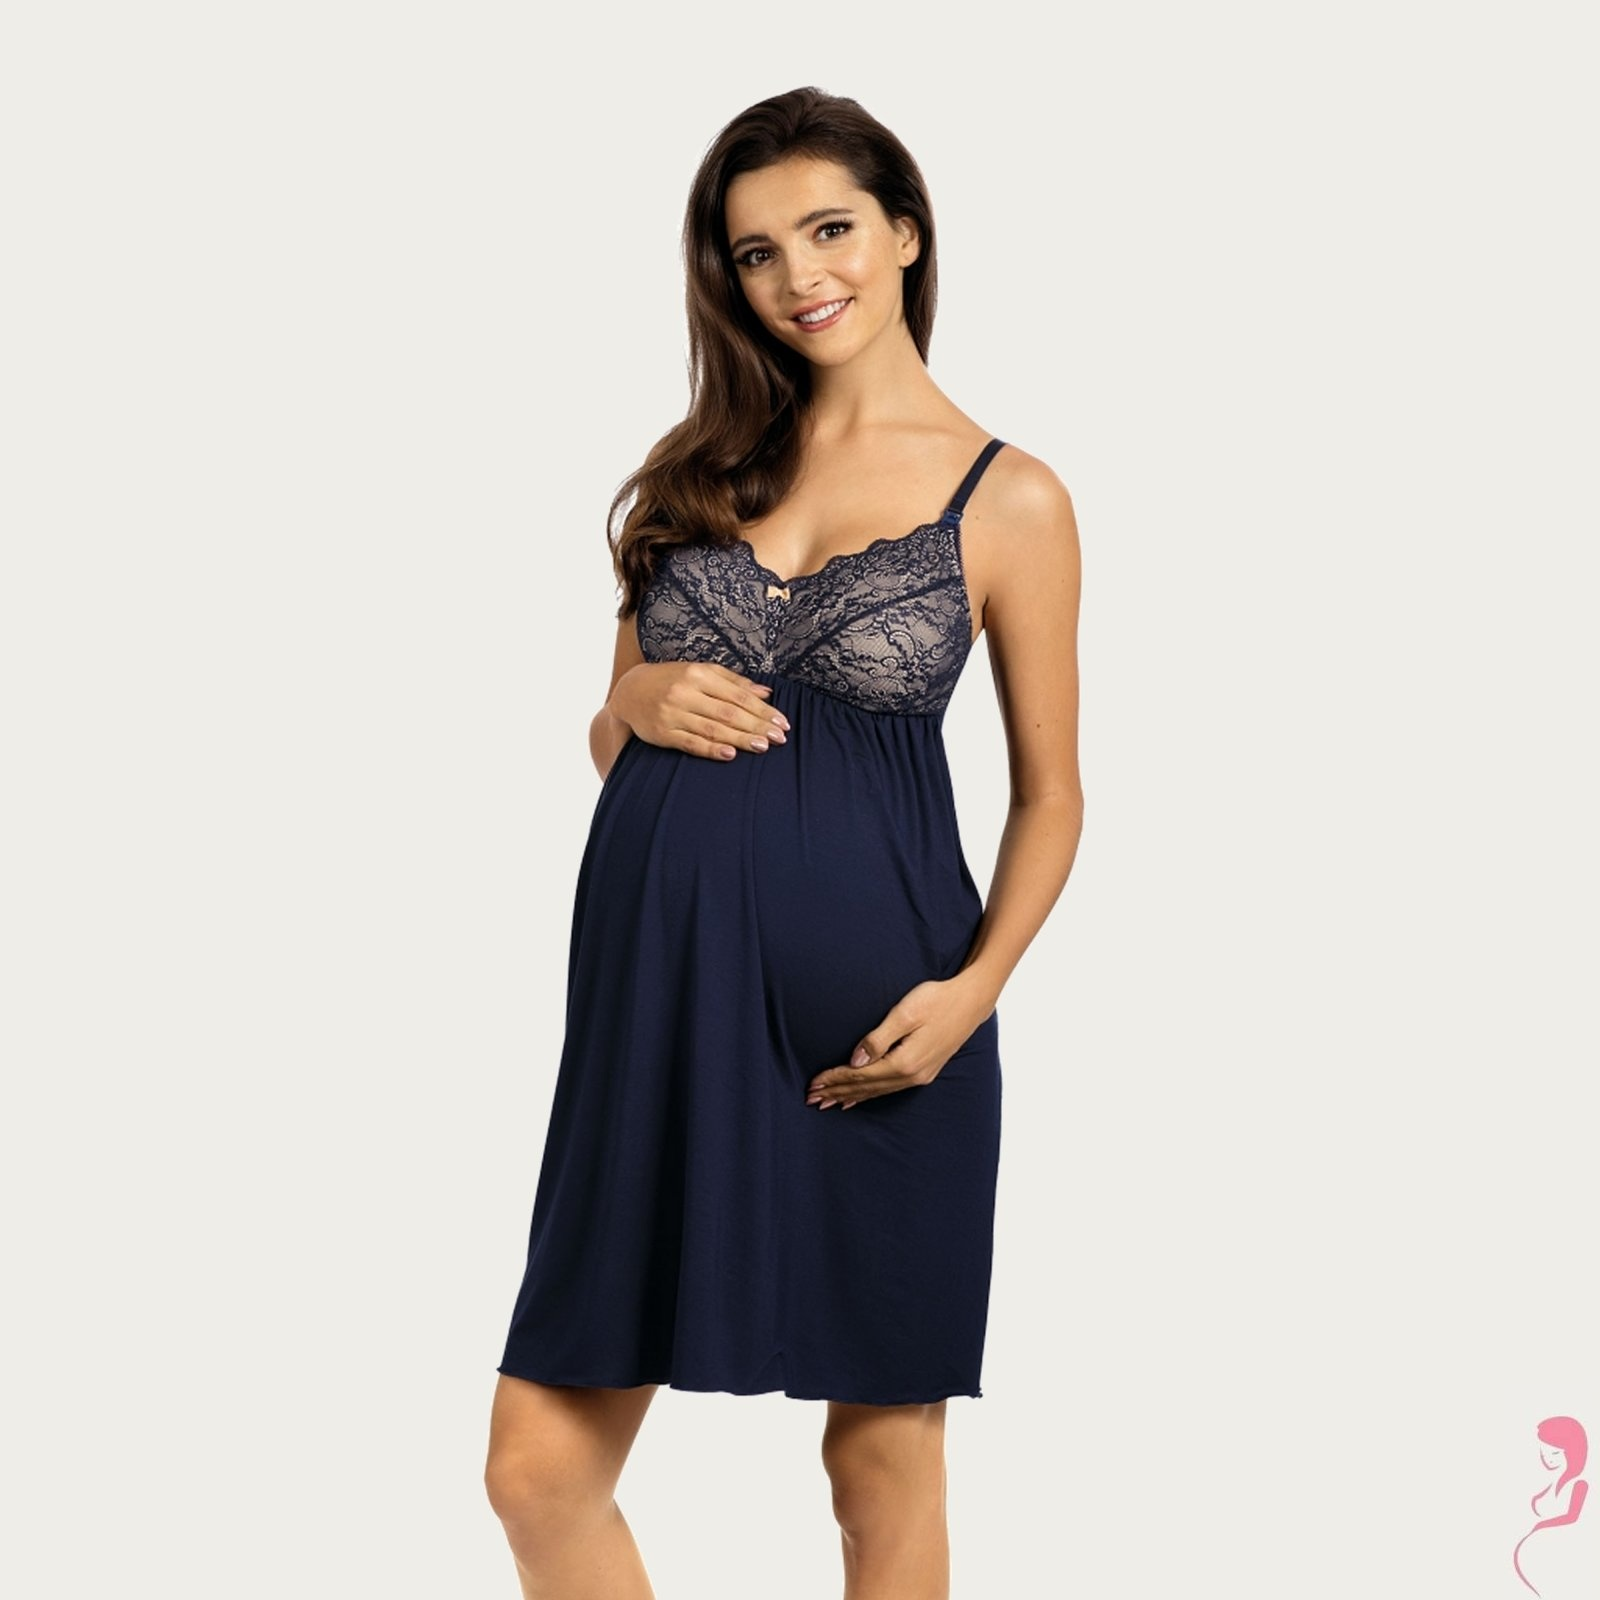 Lupoline Zwangerschapsjurk - Voedingsjurk Blue Nights